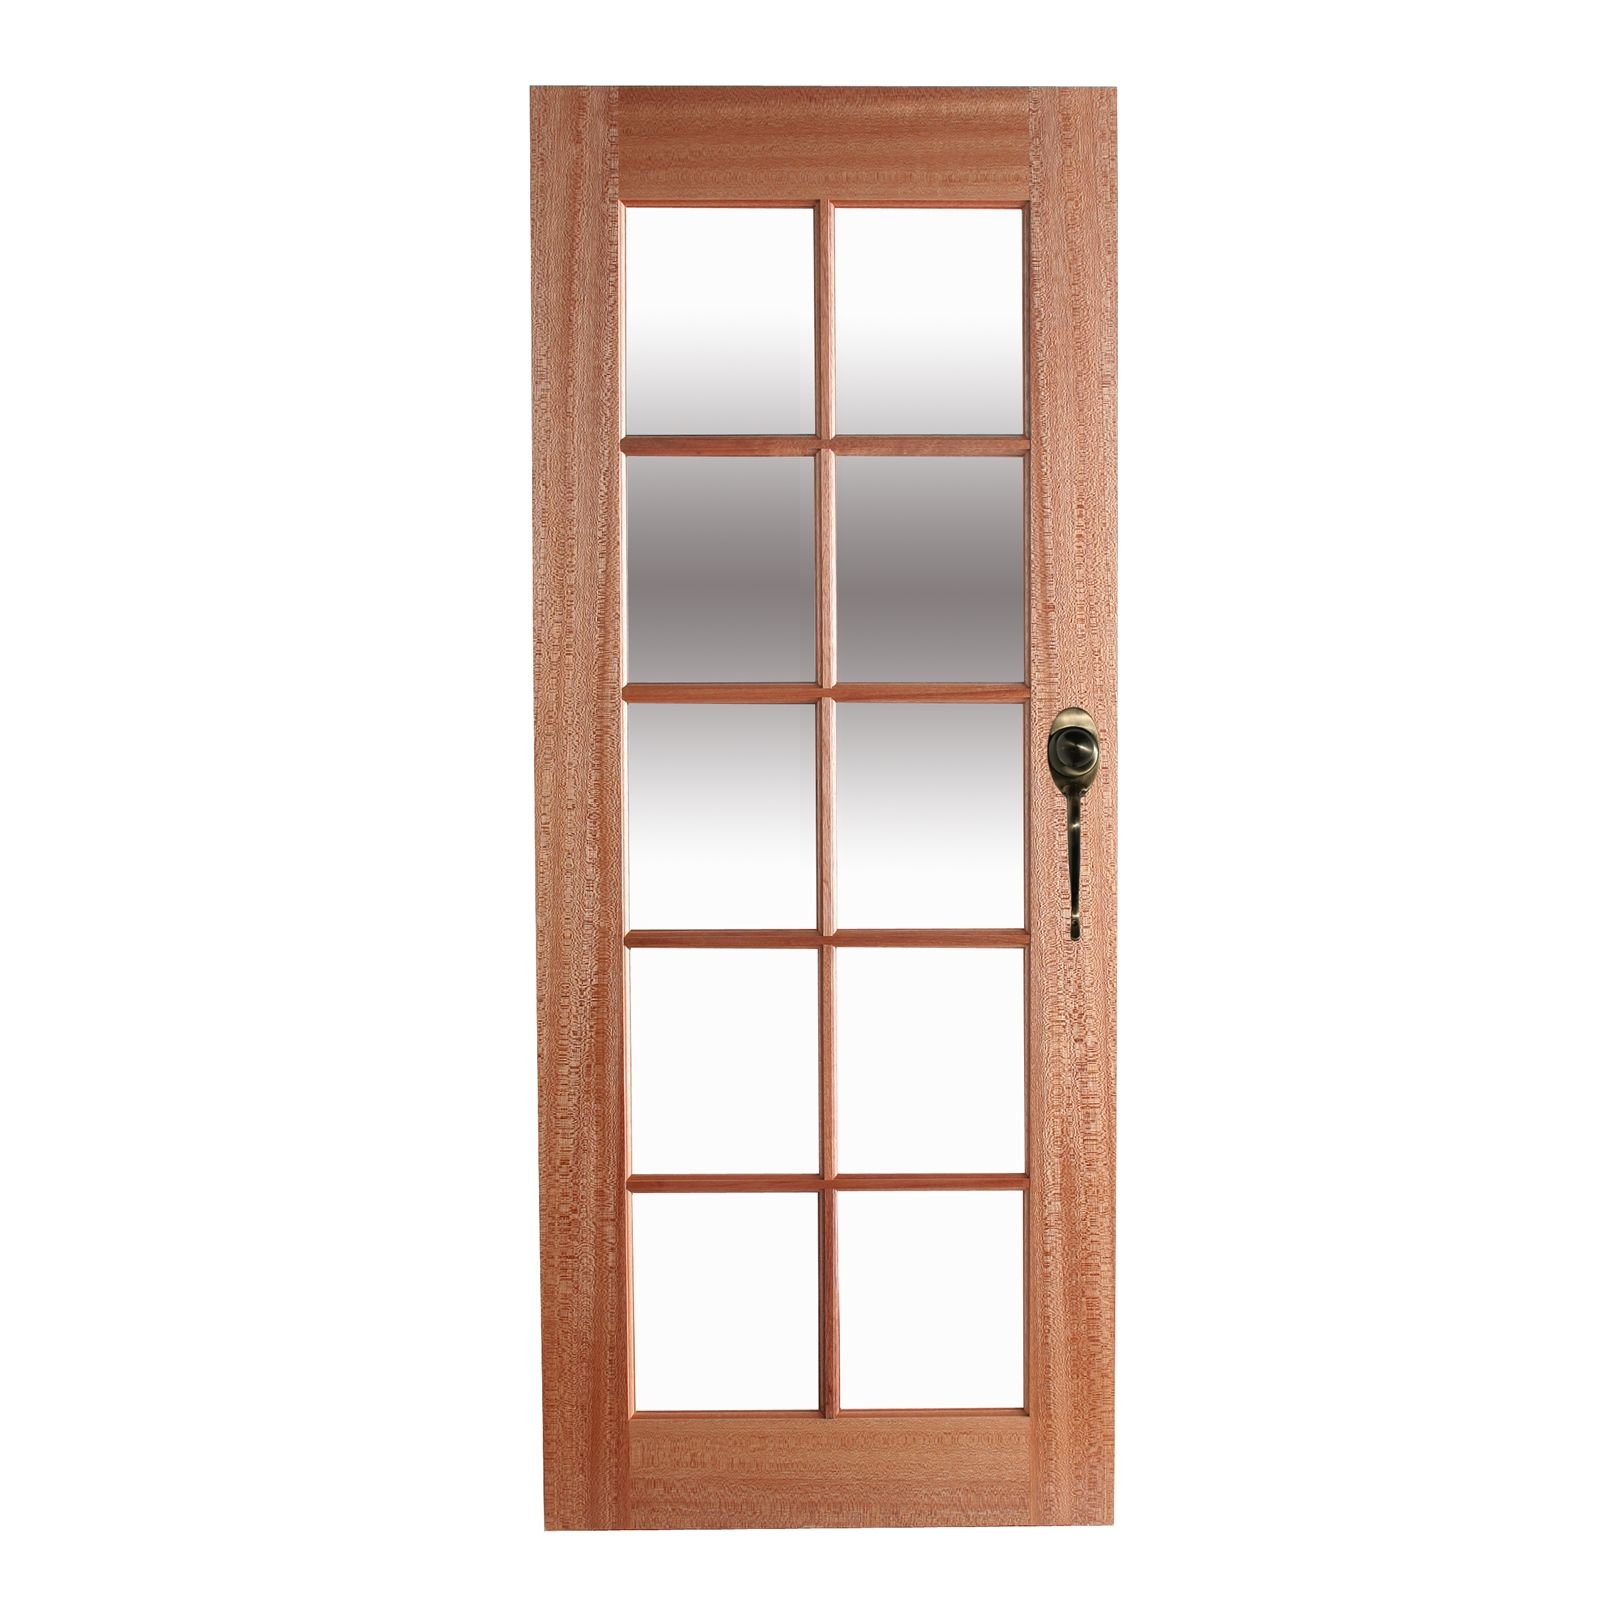 Hume Doors u0026 Timber 2040 x 820 x 40mm Clear Glass 10 Lite Entrance Door  sc 1 st  Pinterest & Hume Doors u0026 Timber 2040 x 820 x 40mm Clear Glass 10 Lite Entrance ...